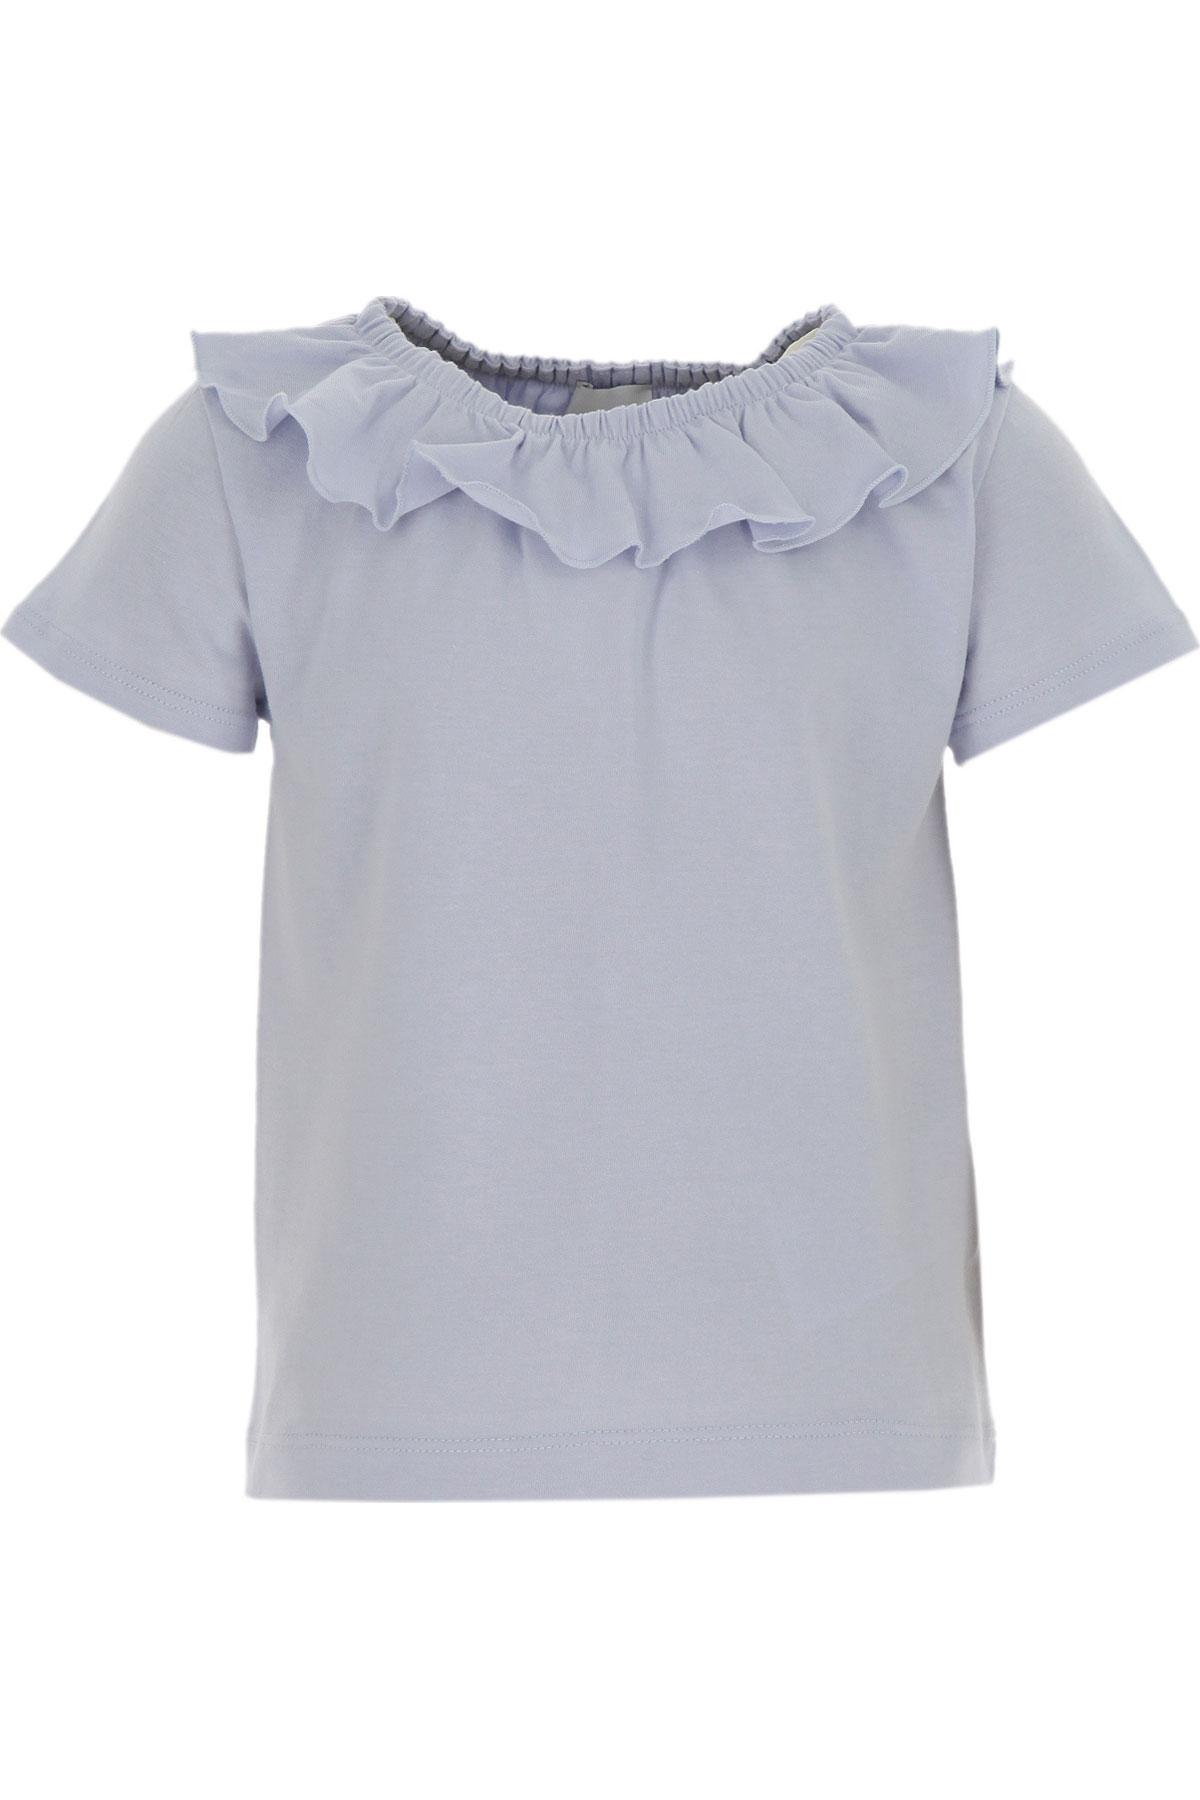 Le Petit Coco Kids T-Shirt for Girls On Sale, Light Blue, Organic Cotton, 2019, 3Y 4Y 6Y 8Y